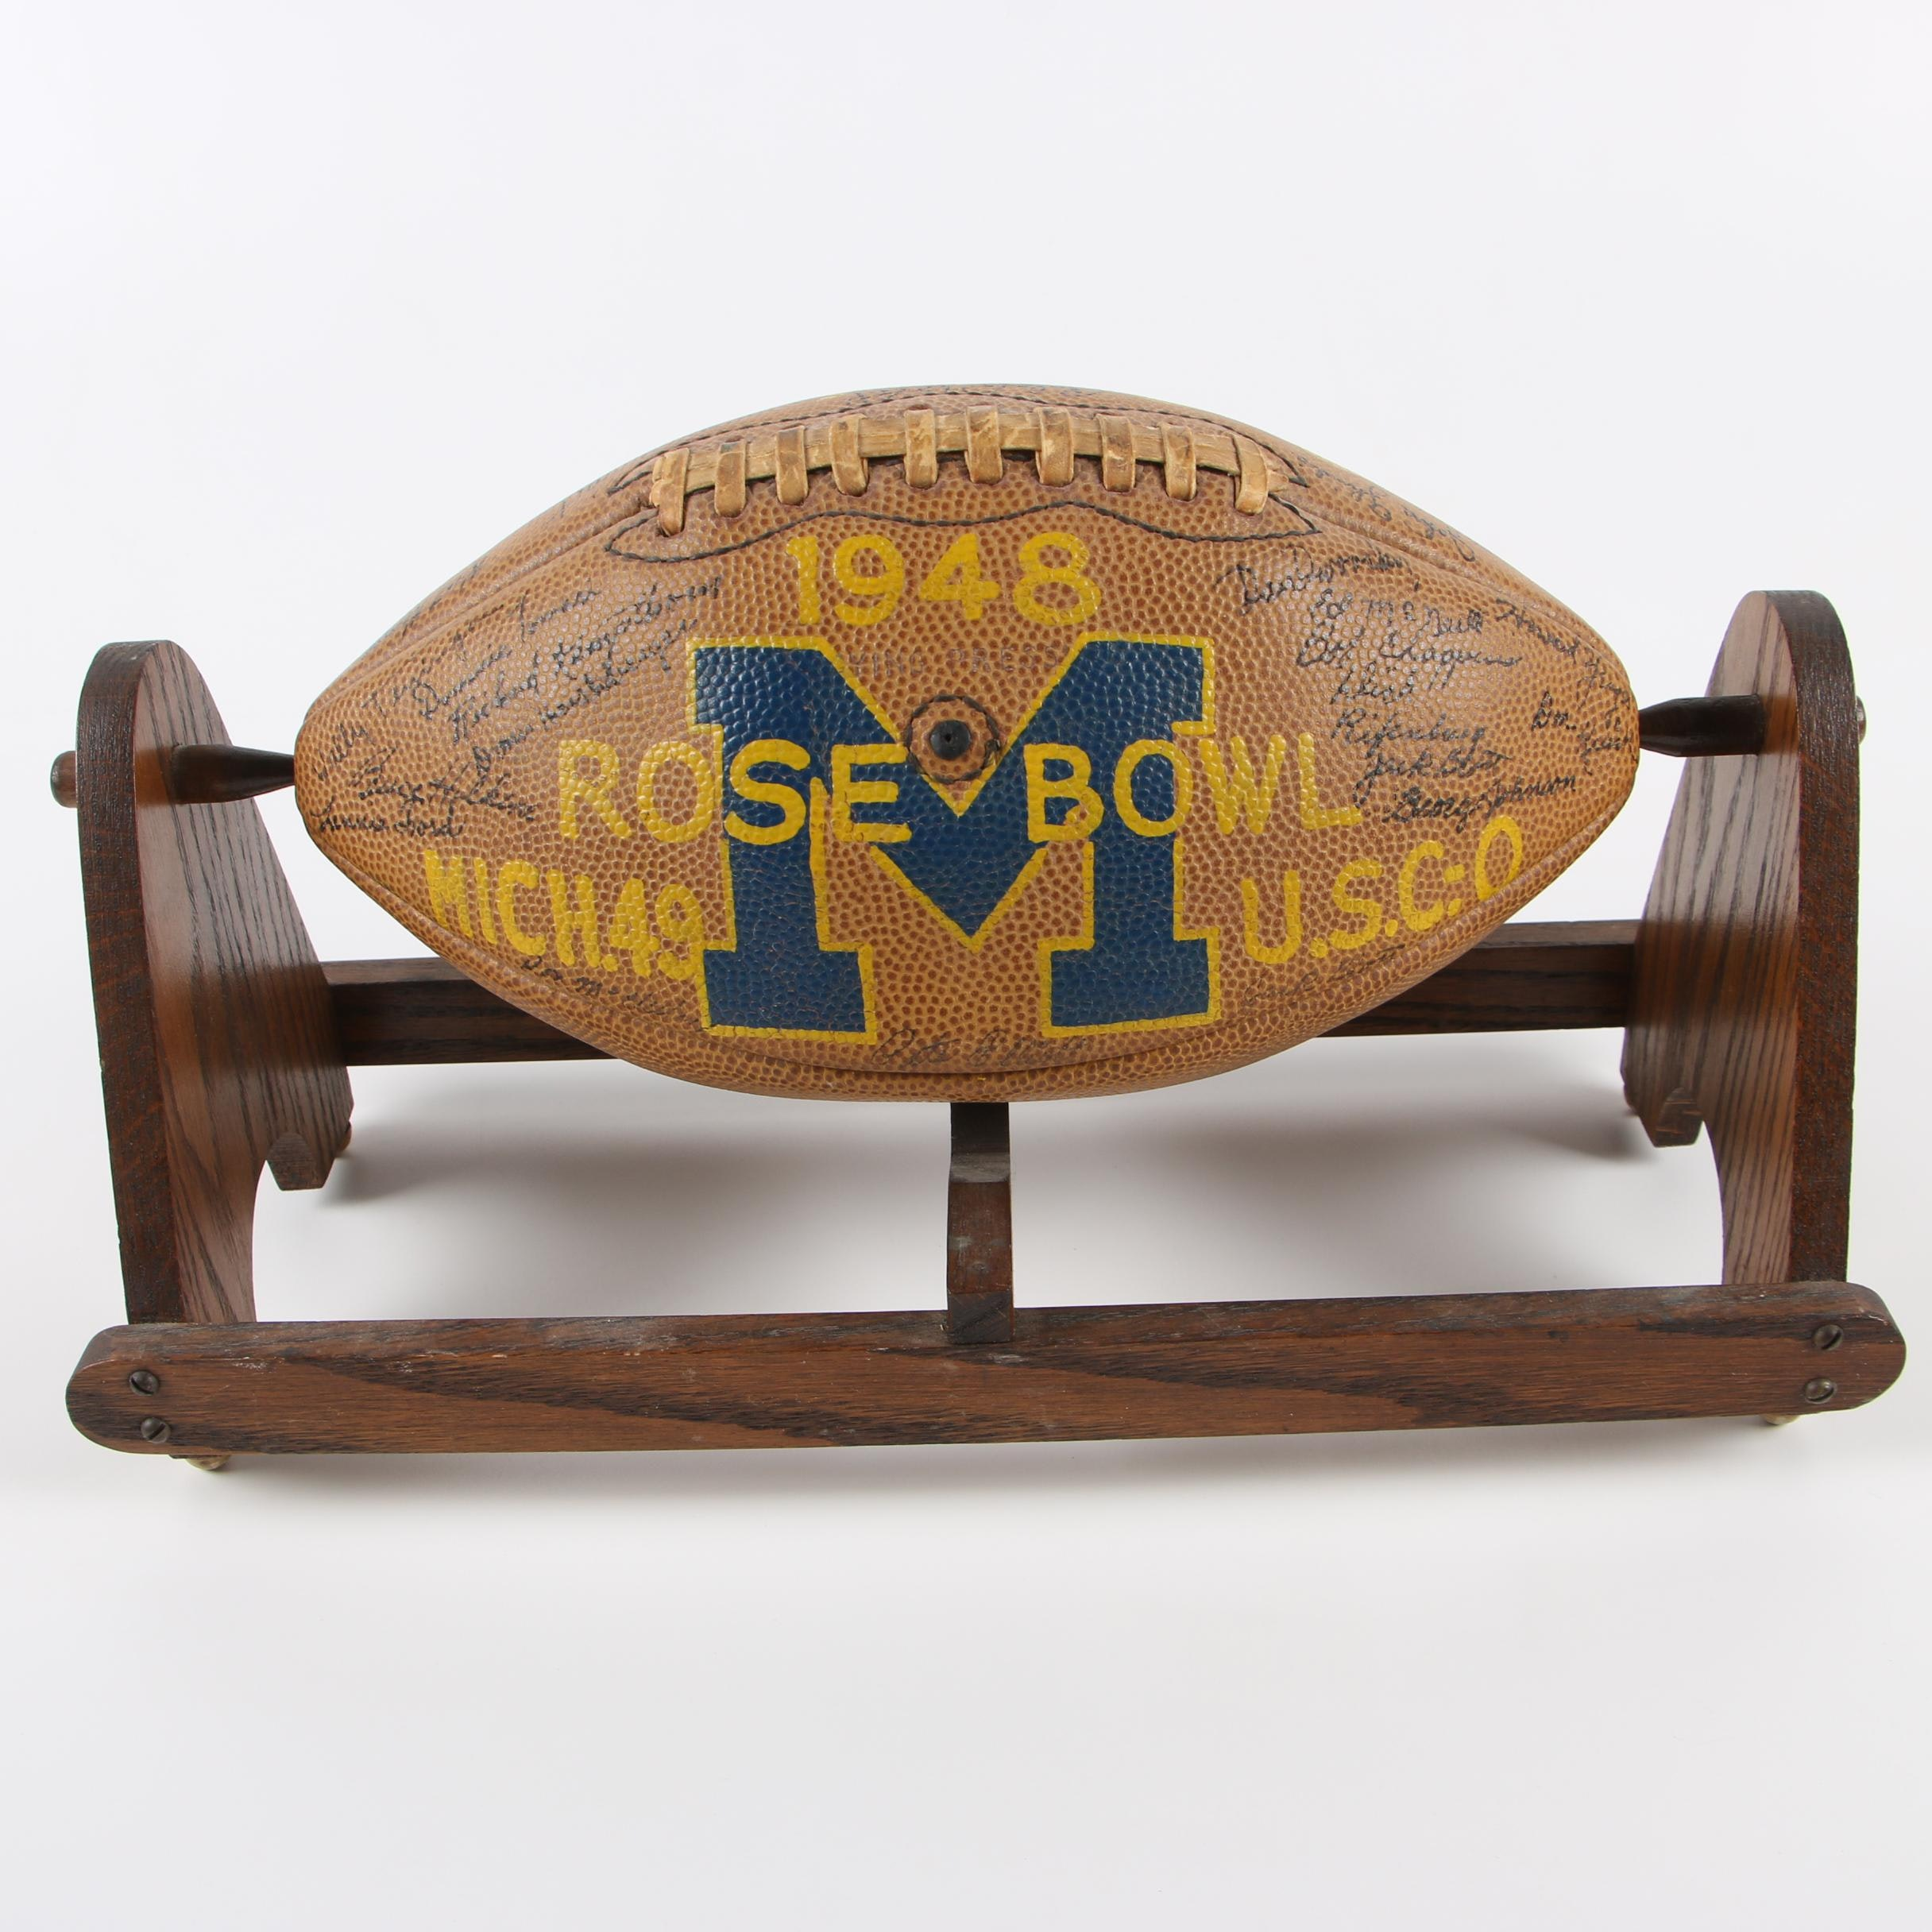 University of Michigan Football Team Signed Football, 1948 Rose Bowl